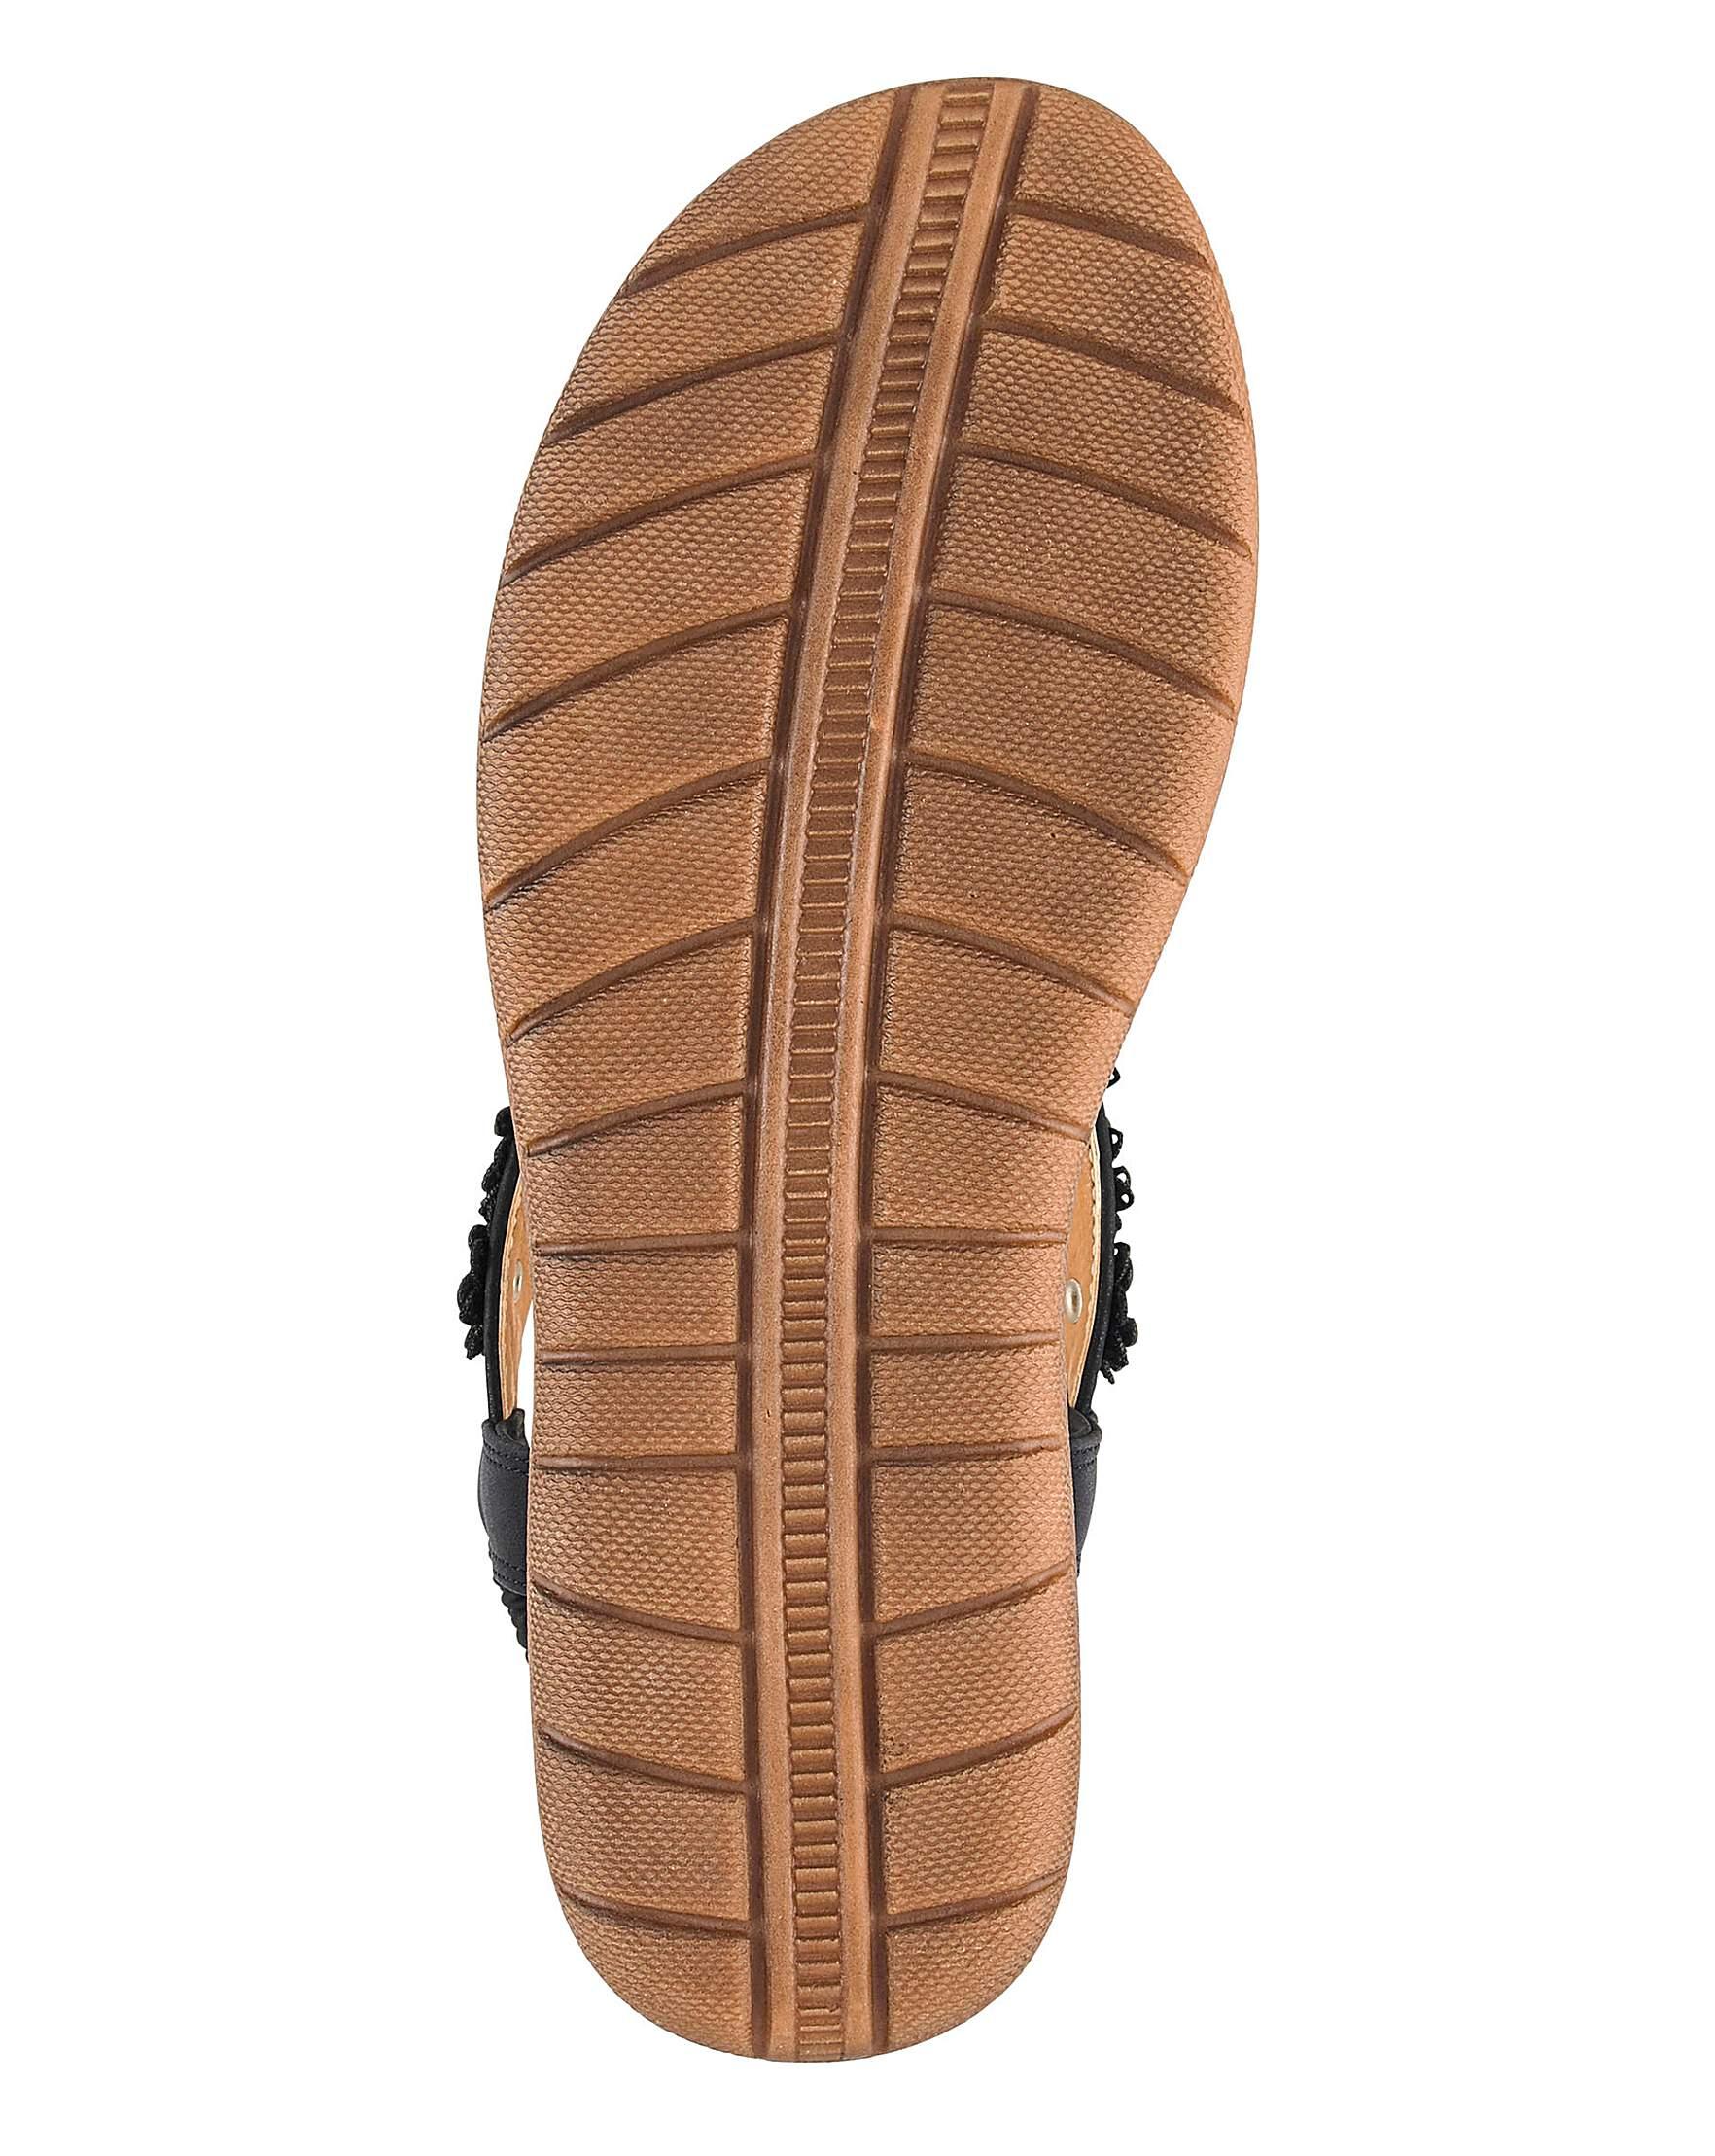 7bceb9198e6 Heavenly Feet Toe Post Sandals EEE Fit